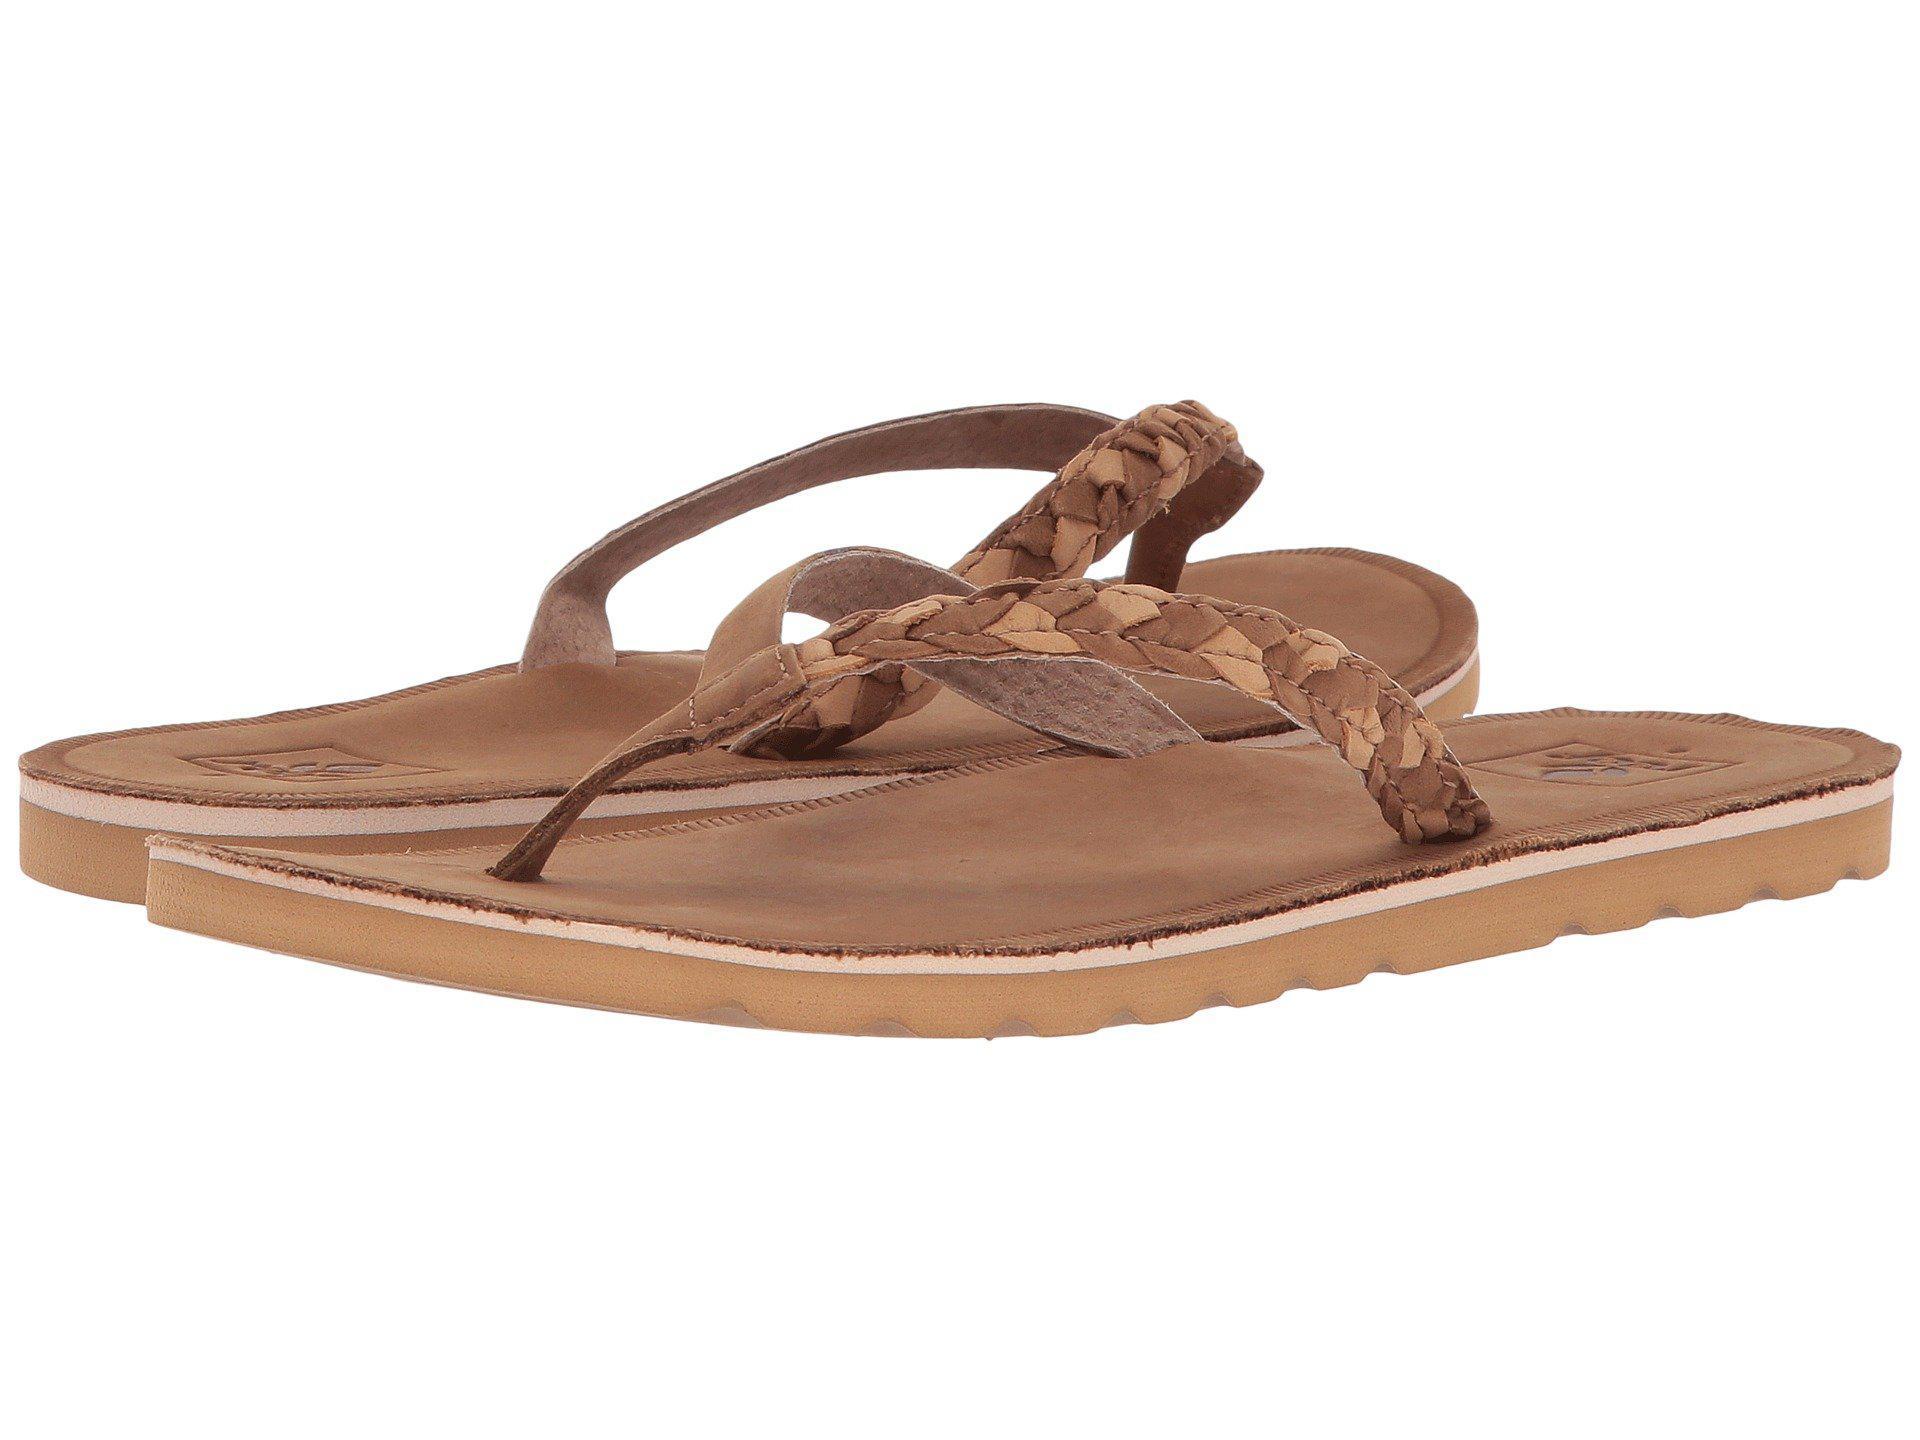 bb98b245b2c8 Lyst - Reef Voyage Sunset (caramel) Women s Sandals in Brown